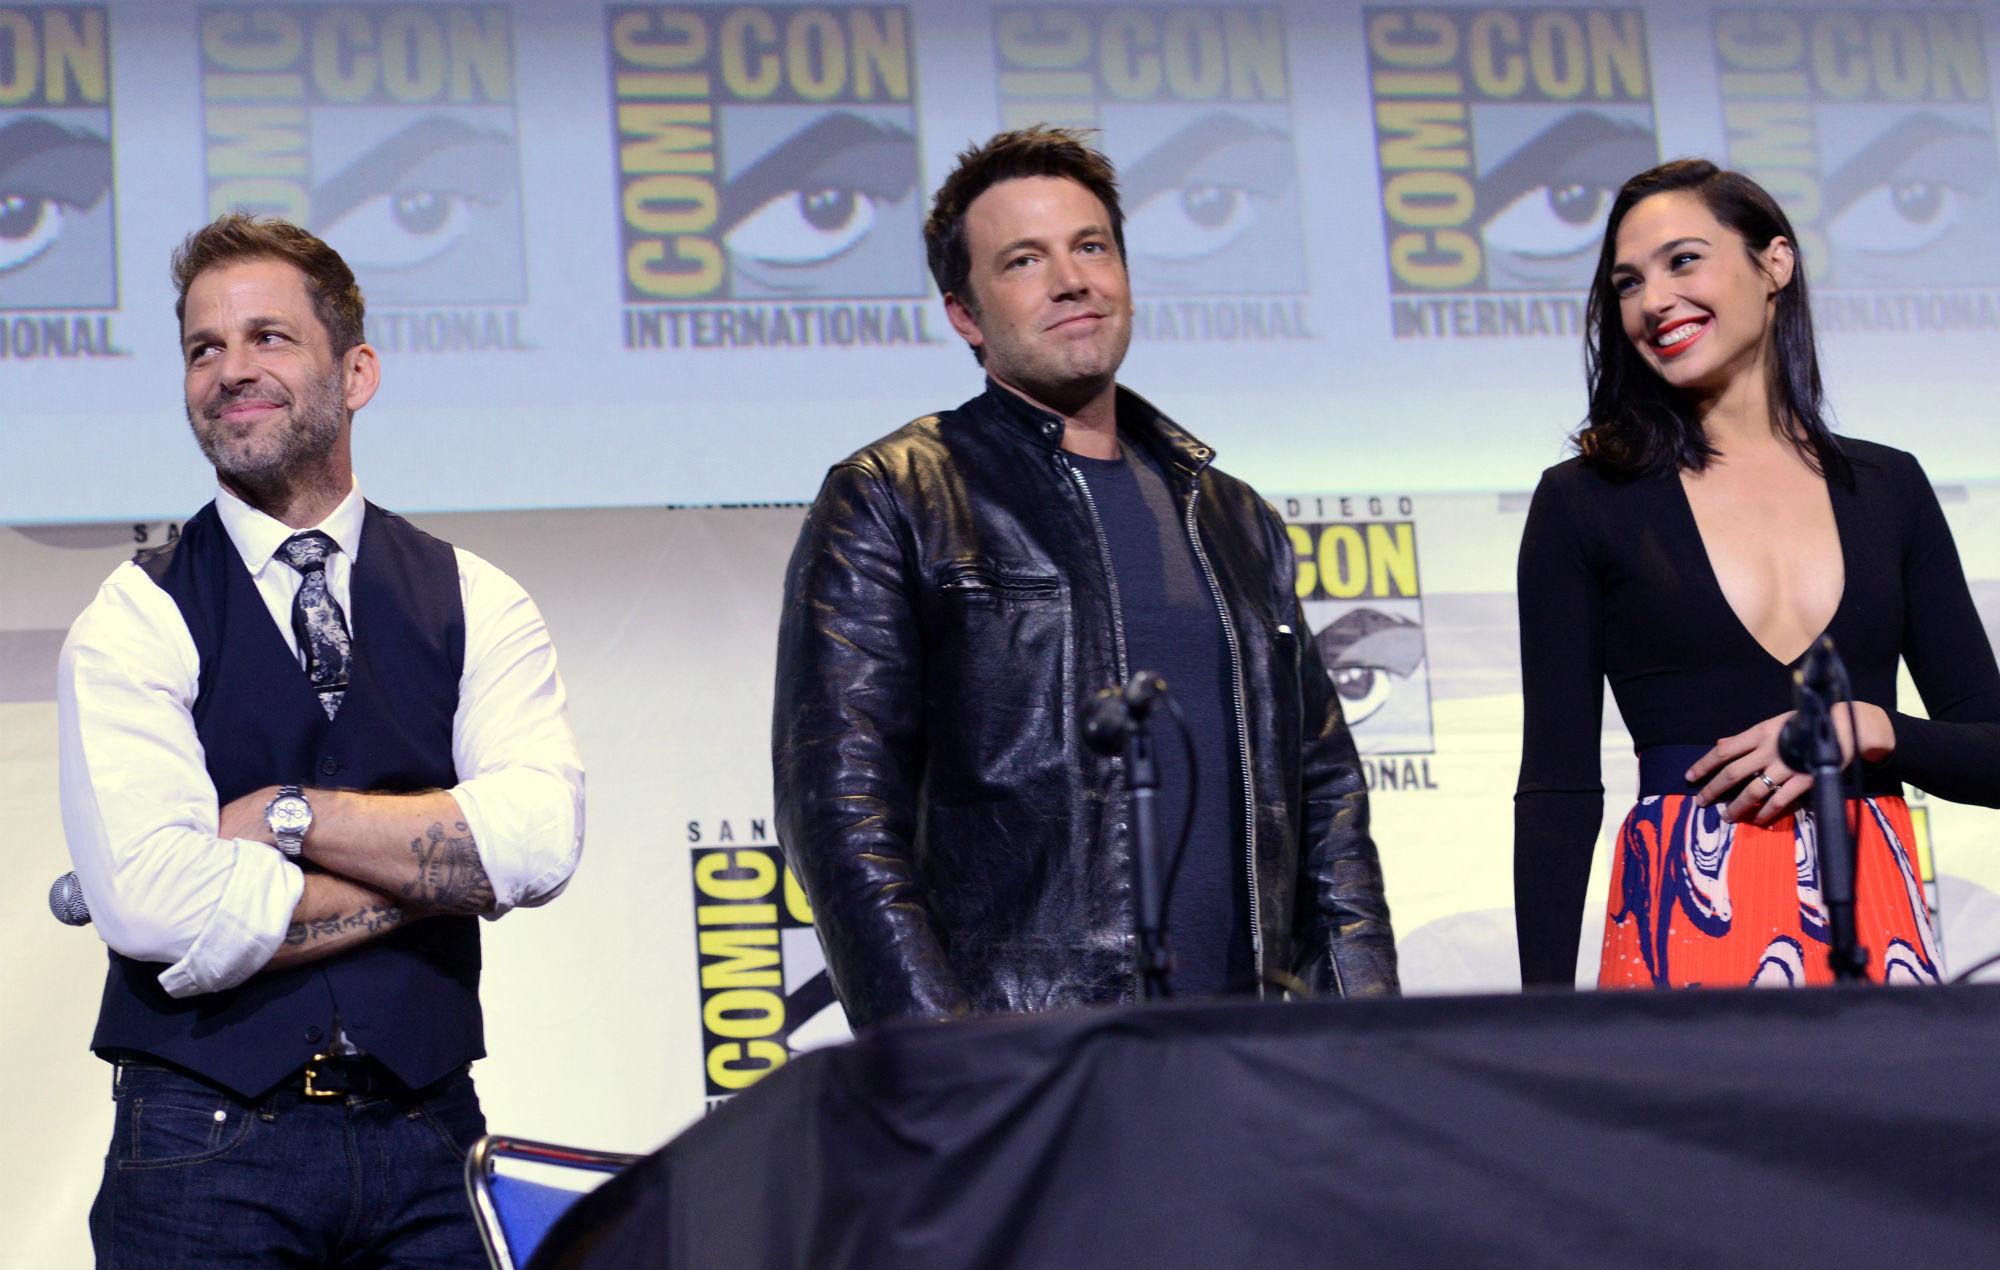 Zack Snyder, Ben Affleck and Gal Gadot